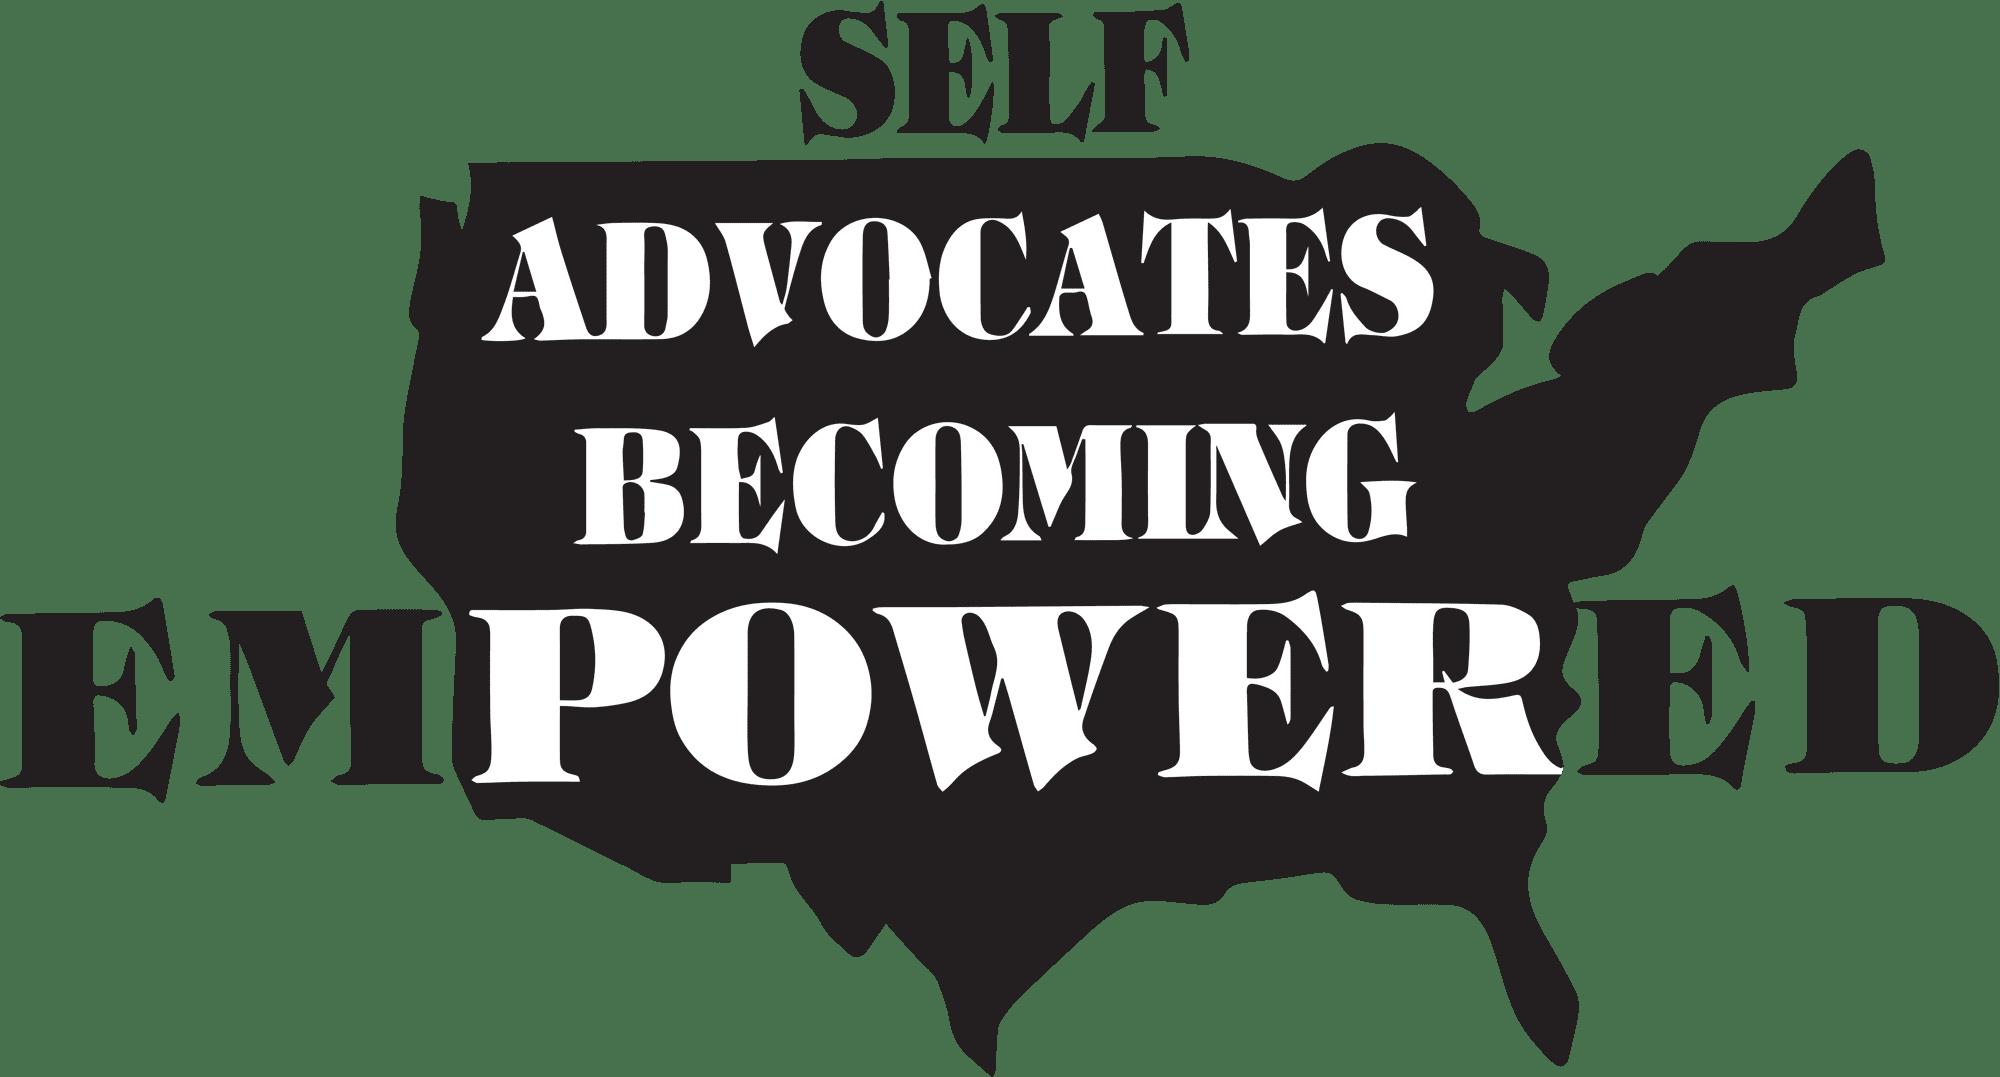 Self Advocates Becoming Empowered logo